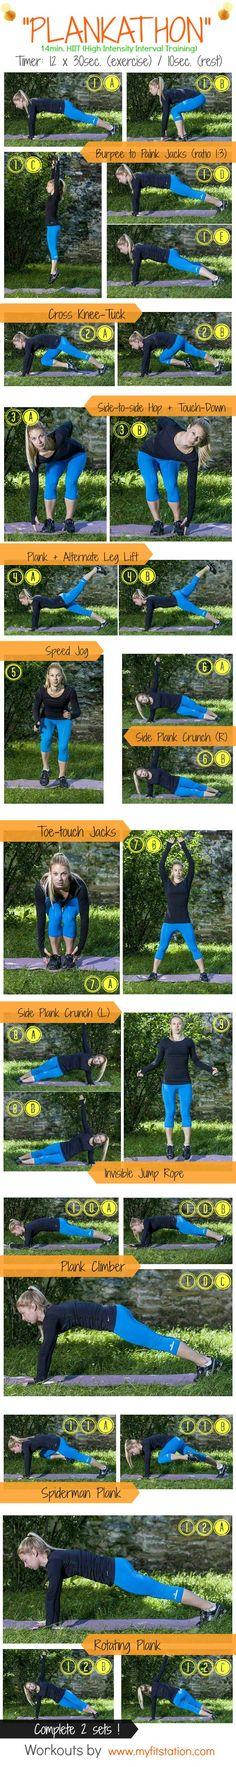 Plankathon workout